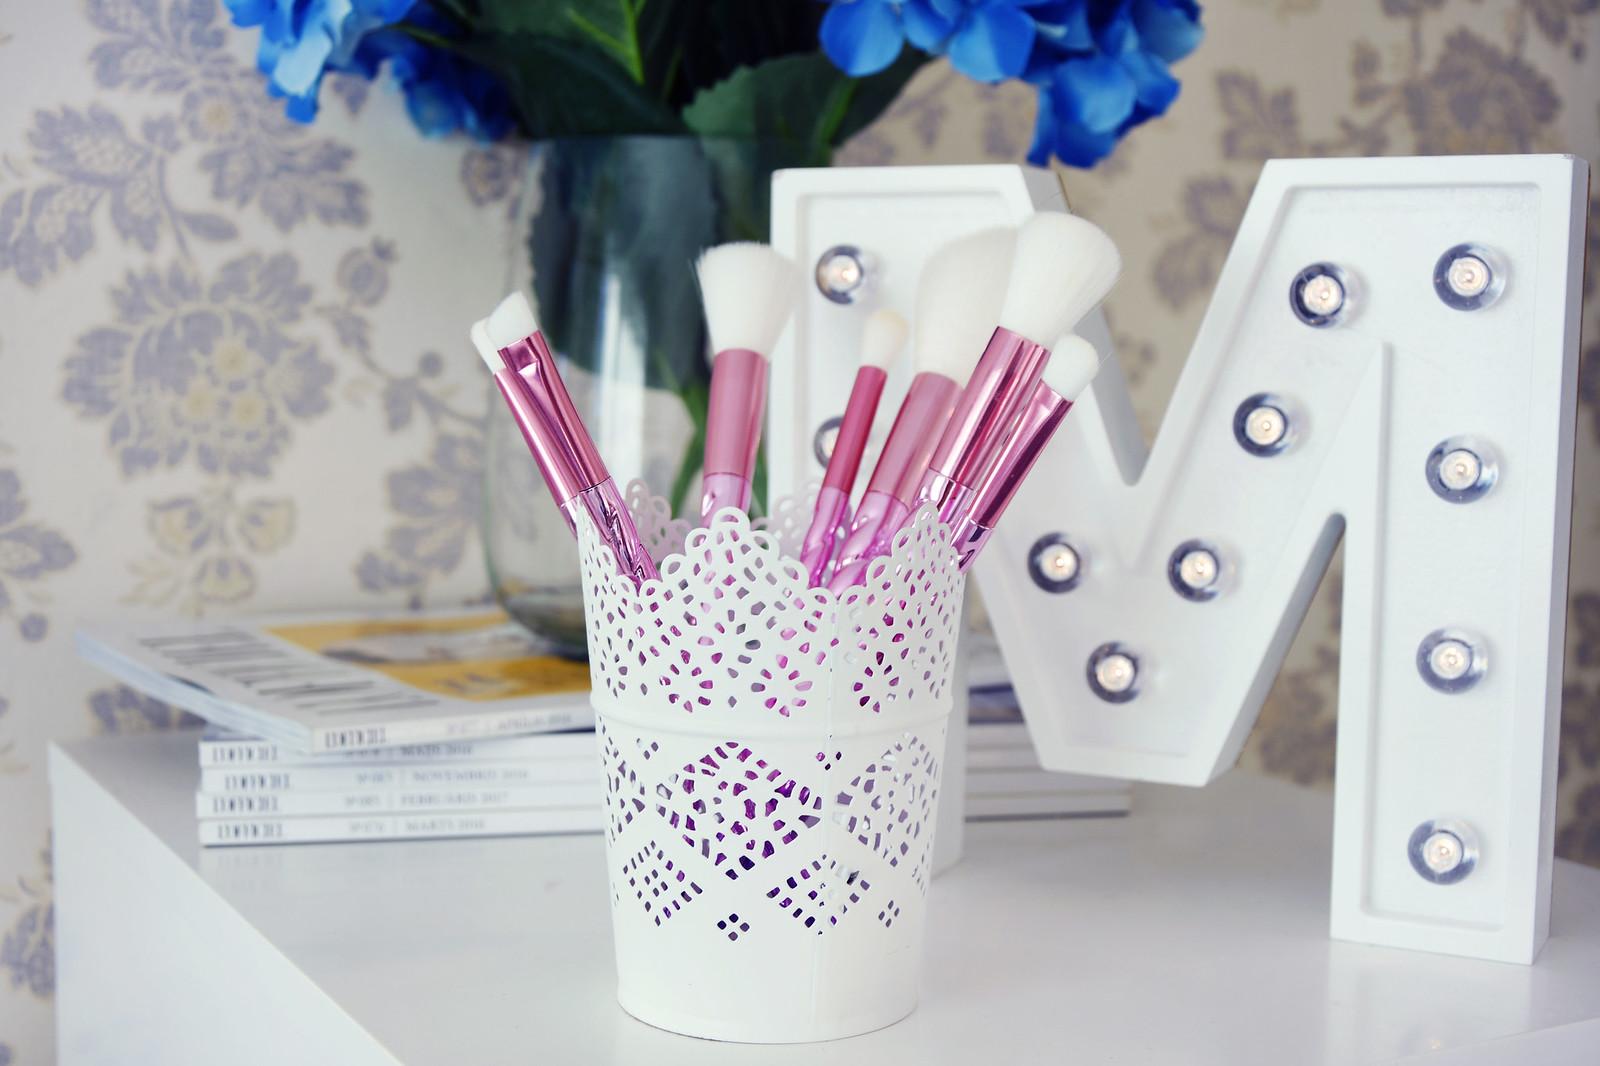 Are brushes on Ebay good